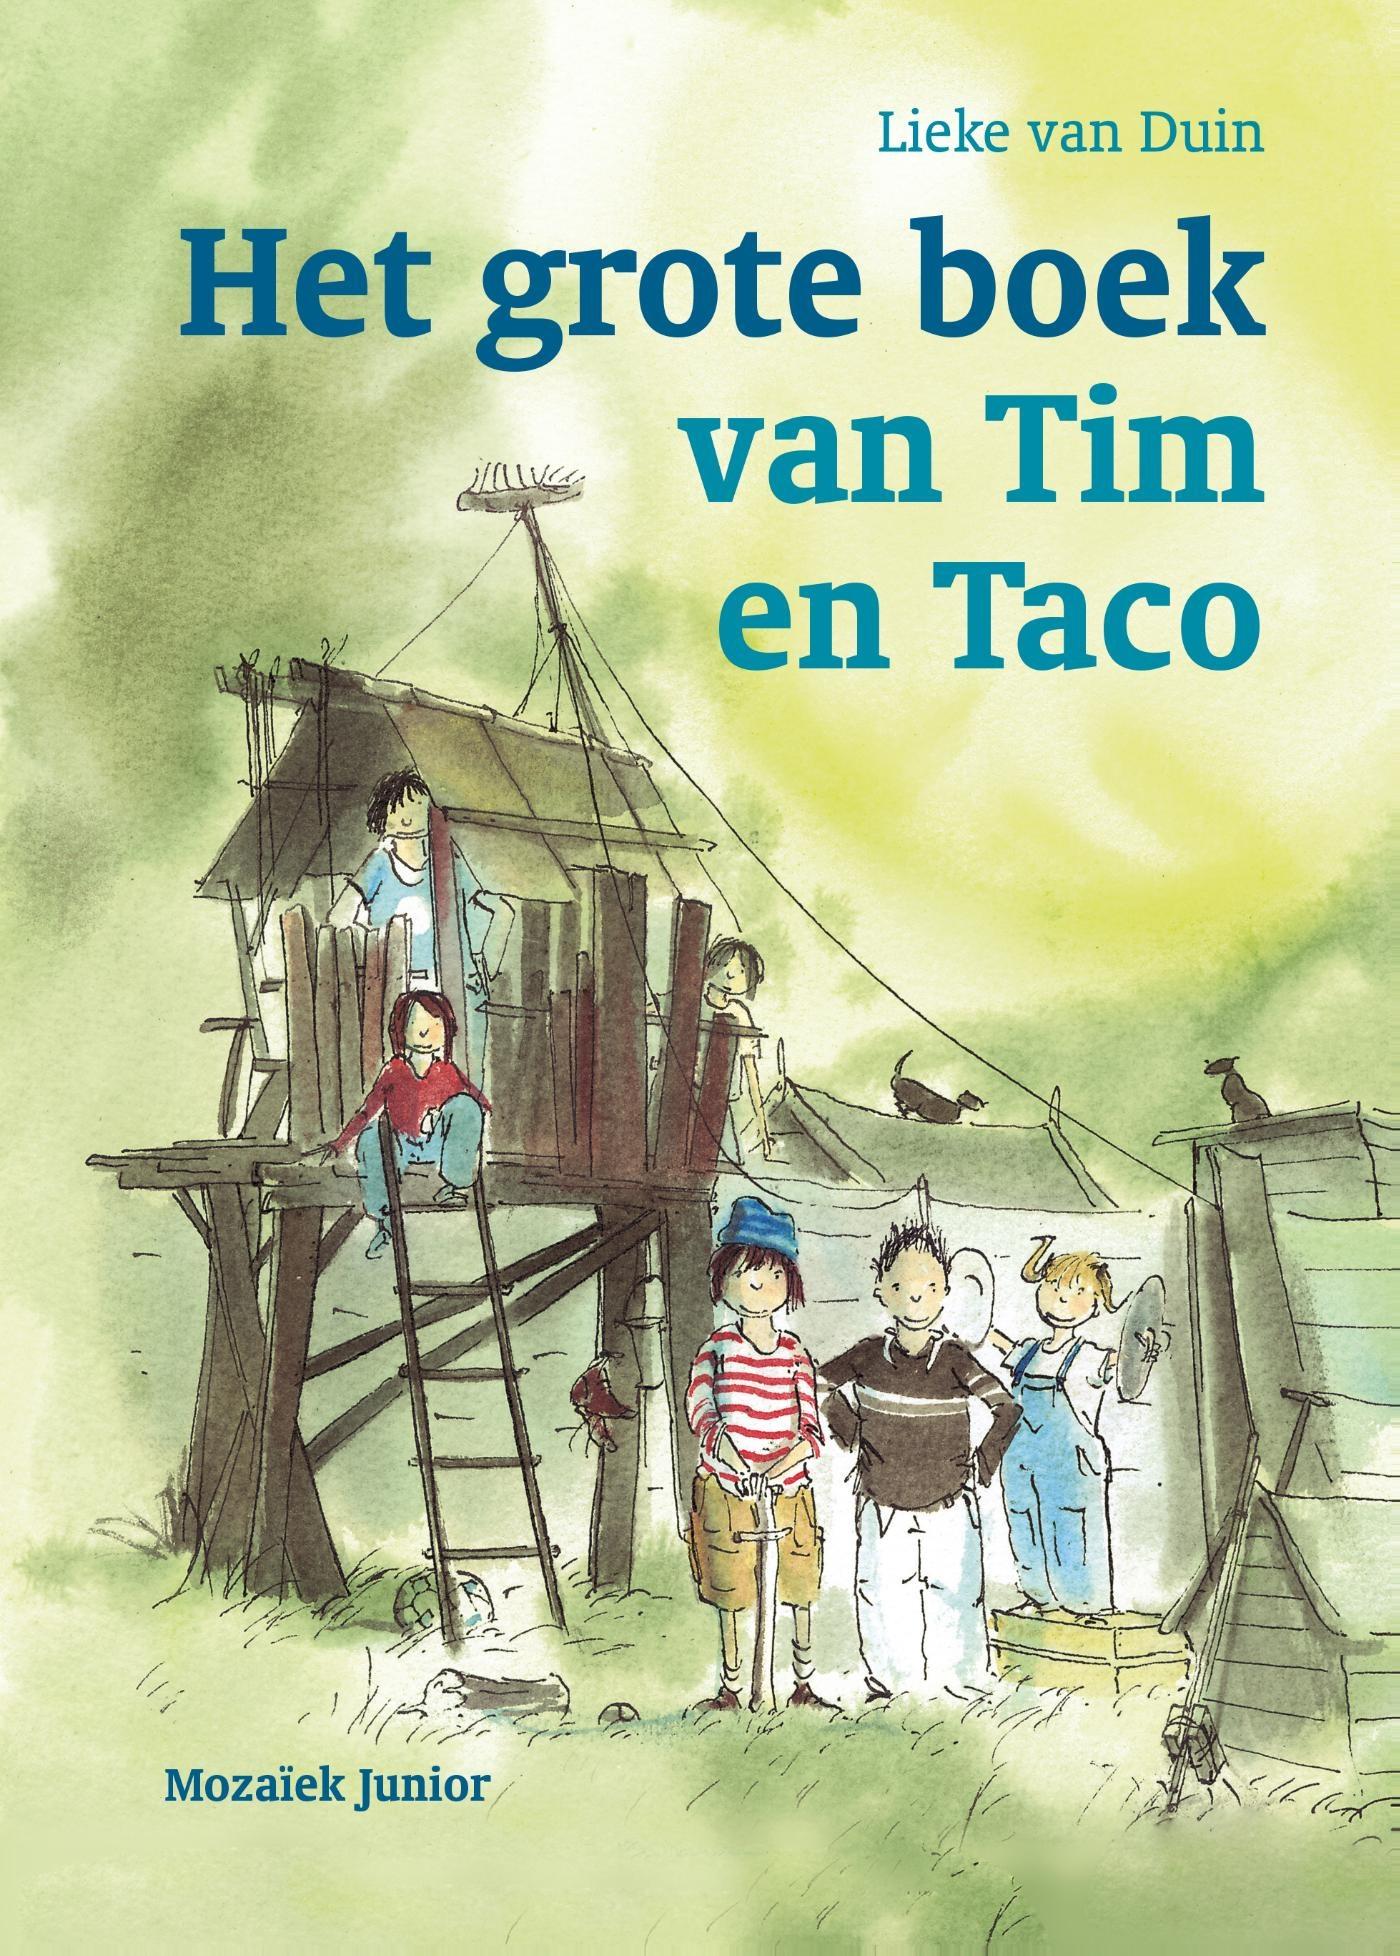 Lieke van Duin, Het grote boek van Tim en Taco